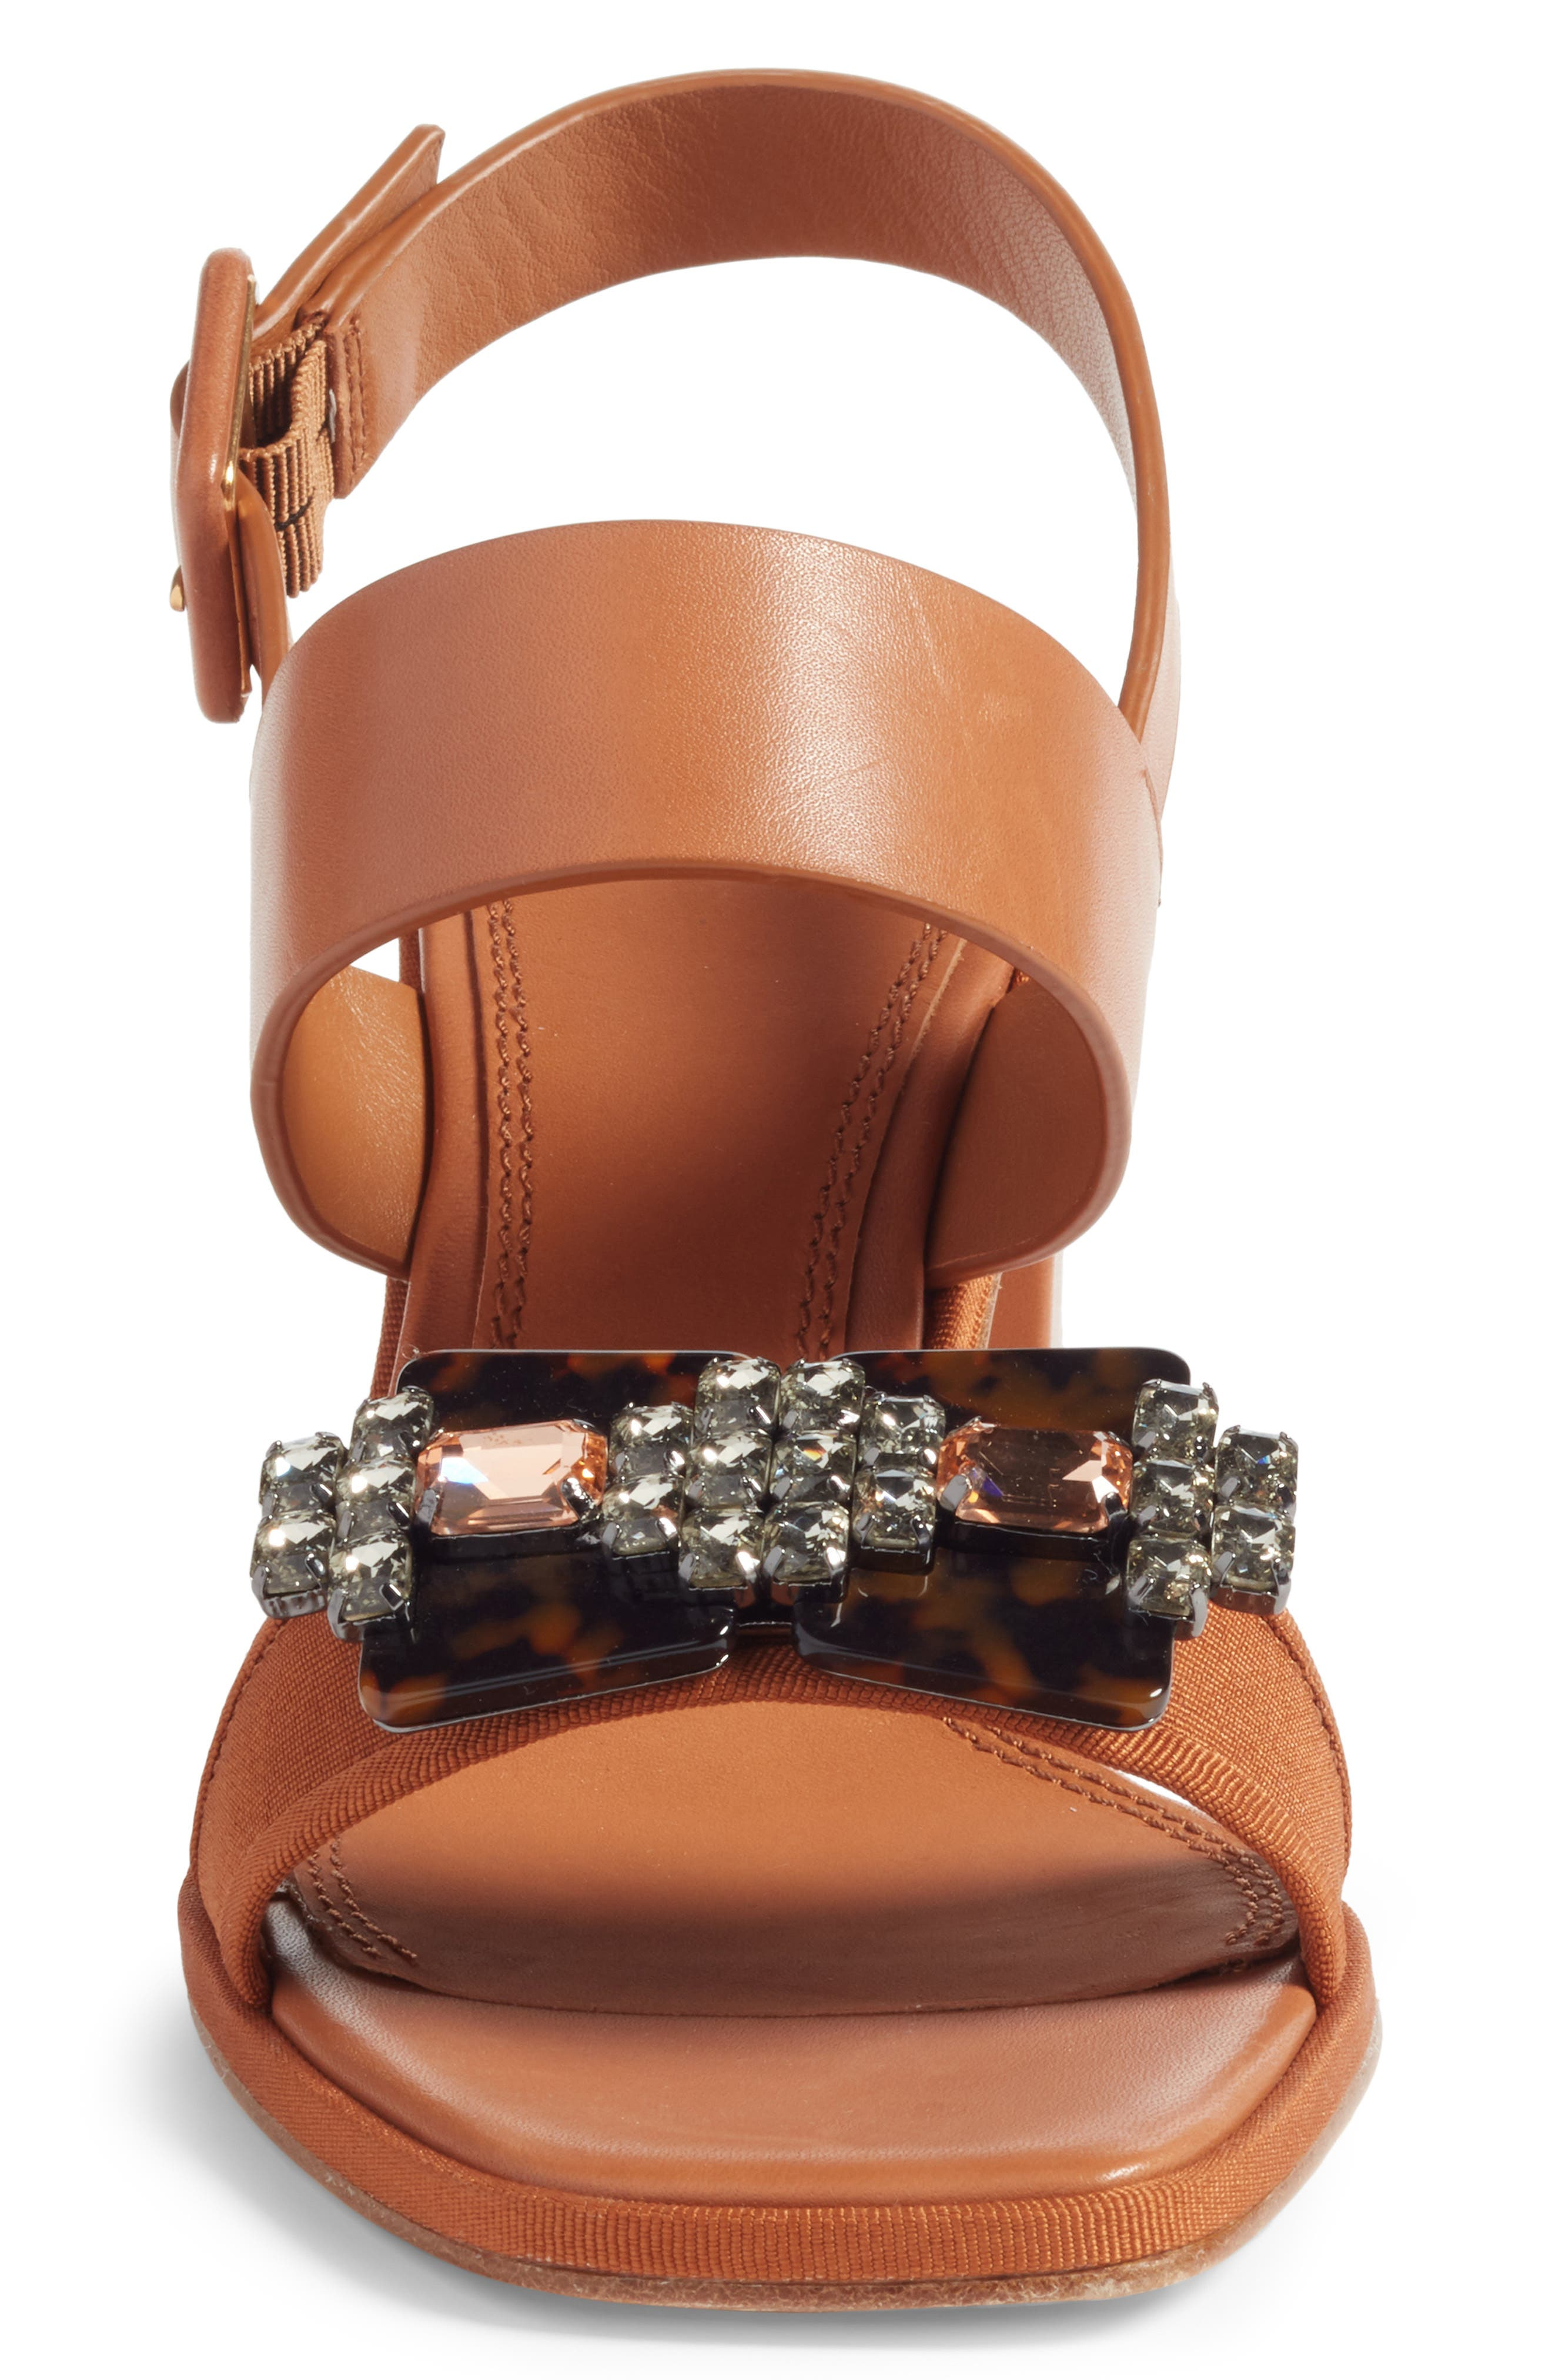 Delaney Embellished Double Strap Sandal,                             Alternate thumbnail 4, color,                             Tan/ Tan